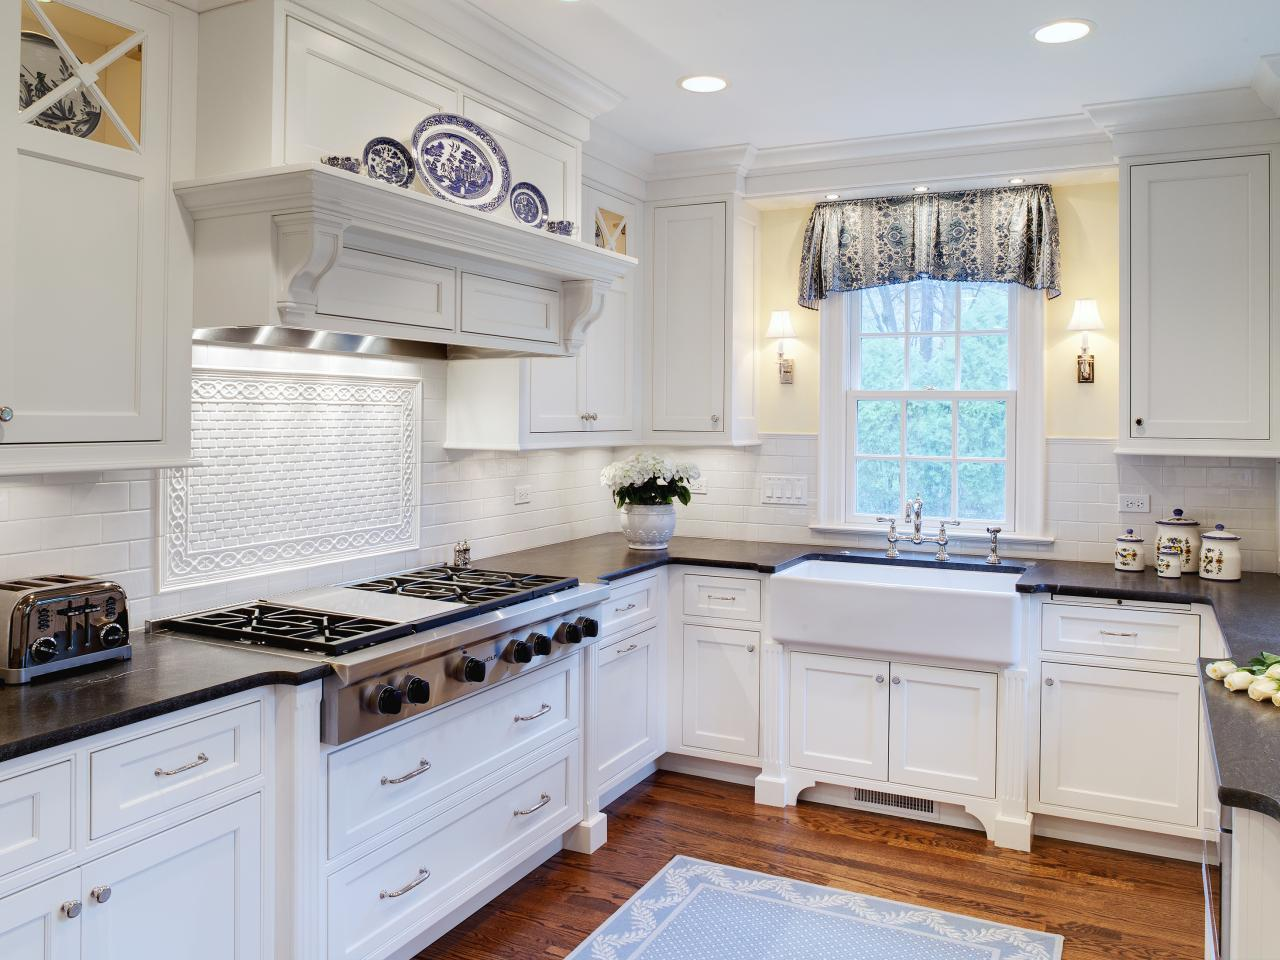 Top 15 Stunning Kitchen Design Ideas and